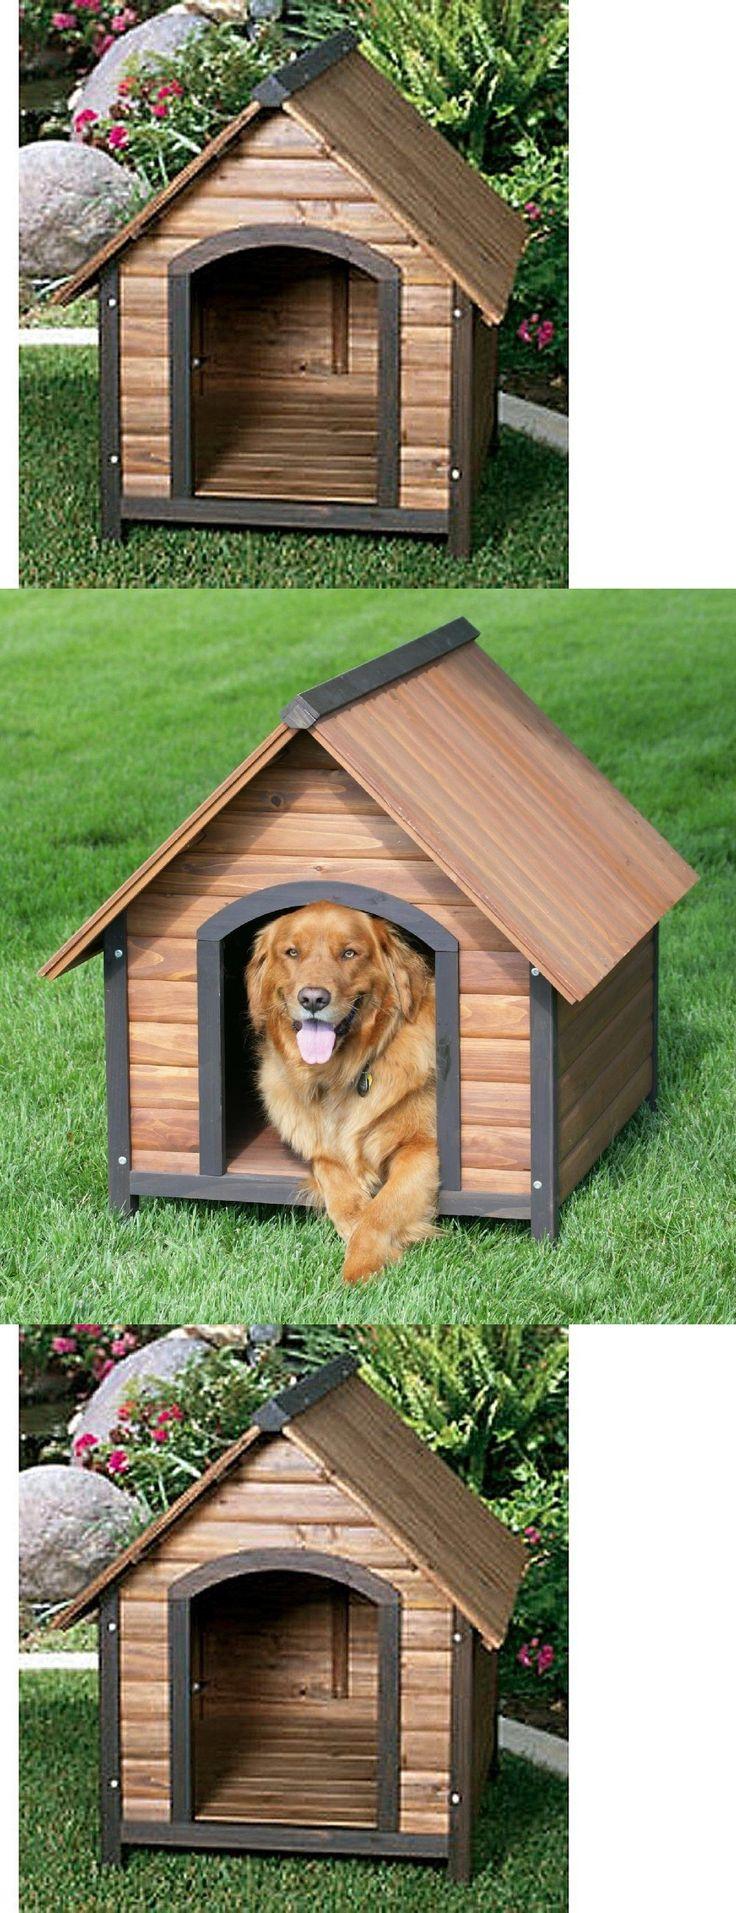 Best 25 Small dog house ideas on Pinterest  Outdoor dog houses Backyard dog area and Outdoor dog